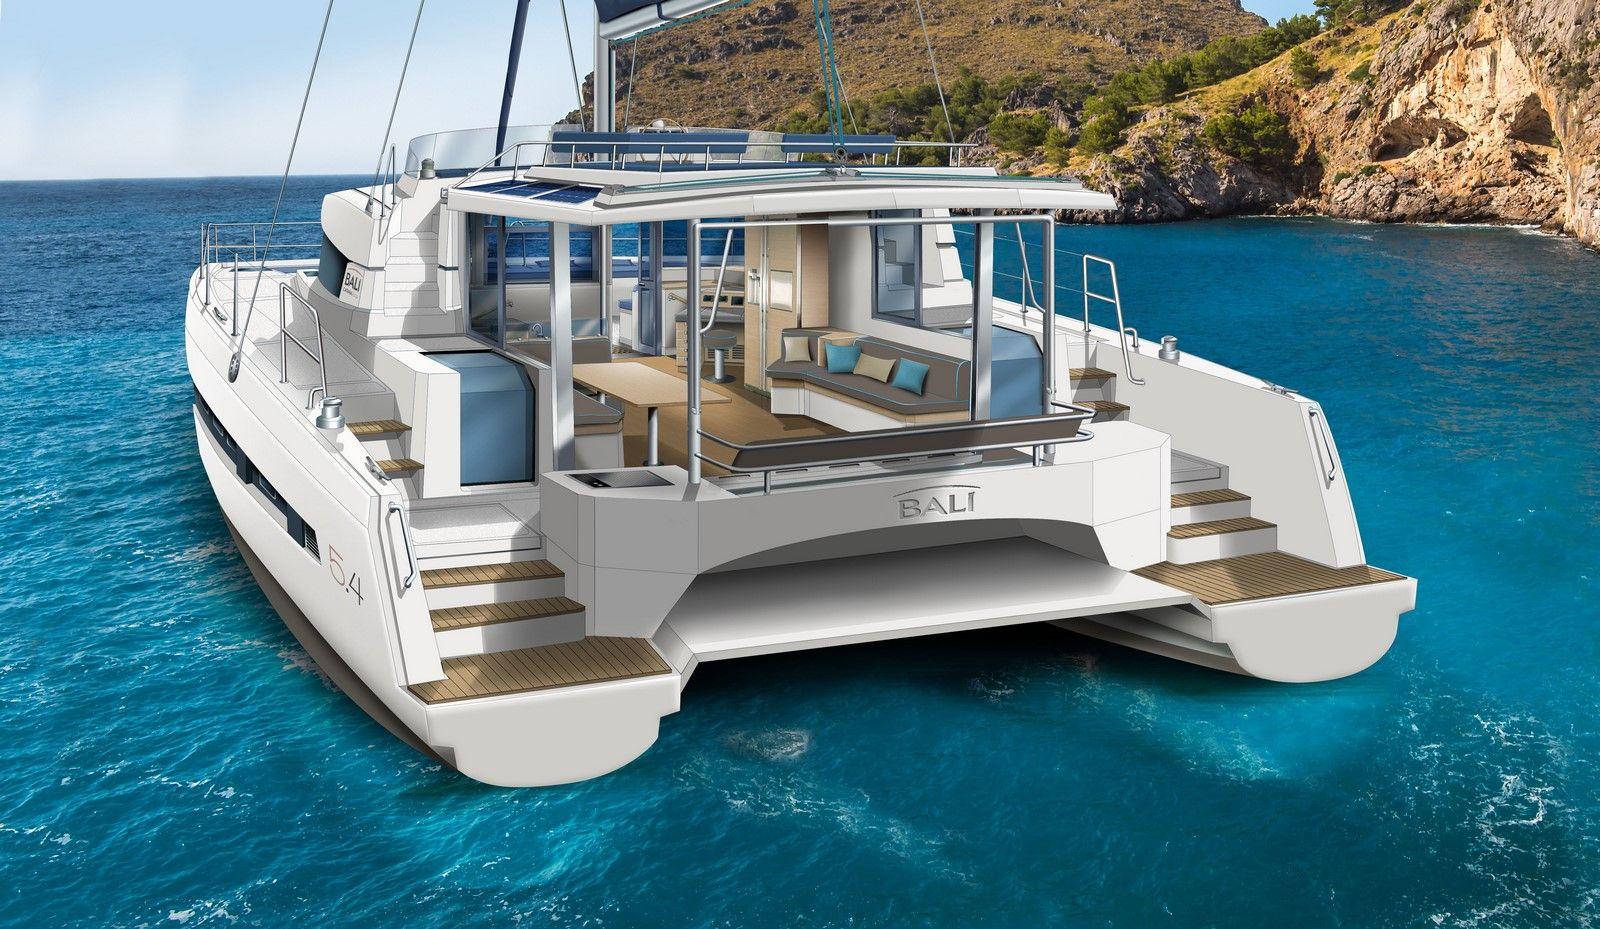 Bali 5.4 - 6 Cabins - Naples - Amalfi - Capri - Positano